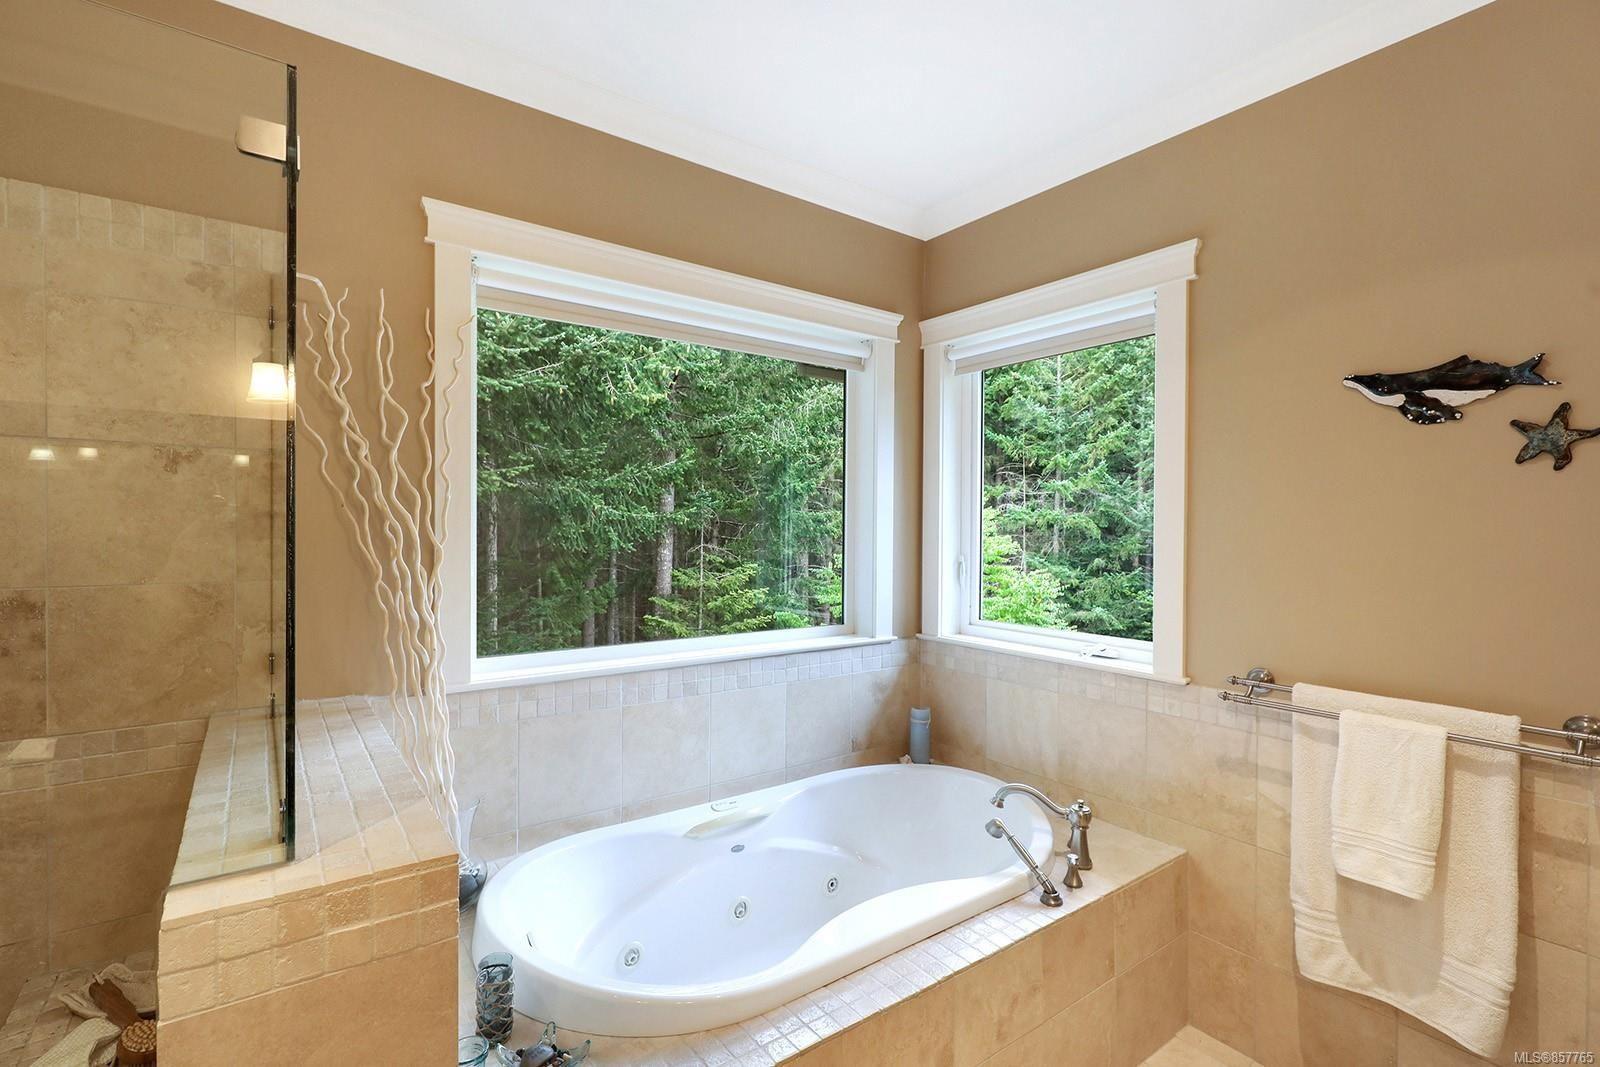 Photo 30: Photos: 1516 Highridge Dr in : CV Comox (Town of) House for sale (Comox Valley)  : MLS®# 857765